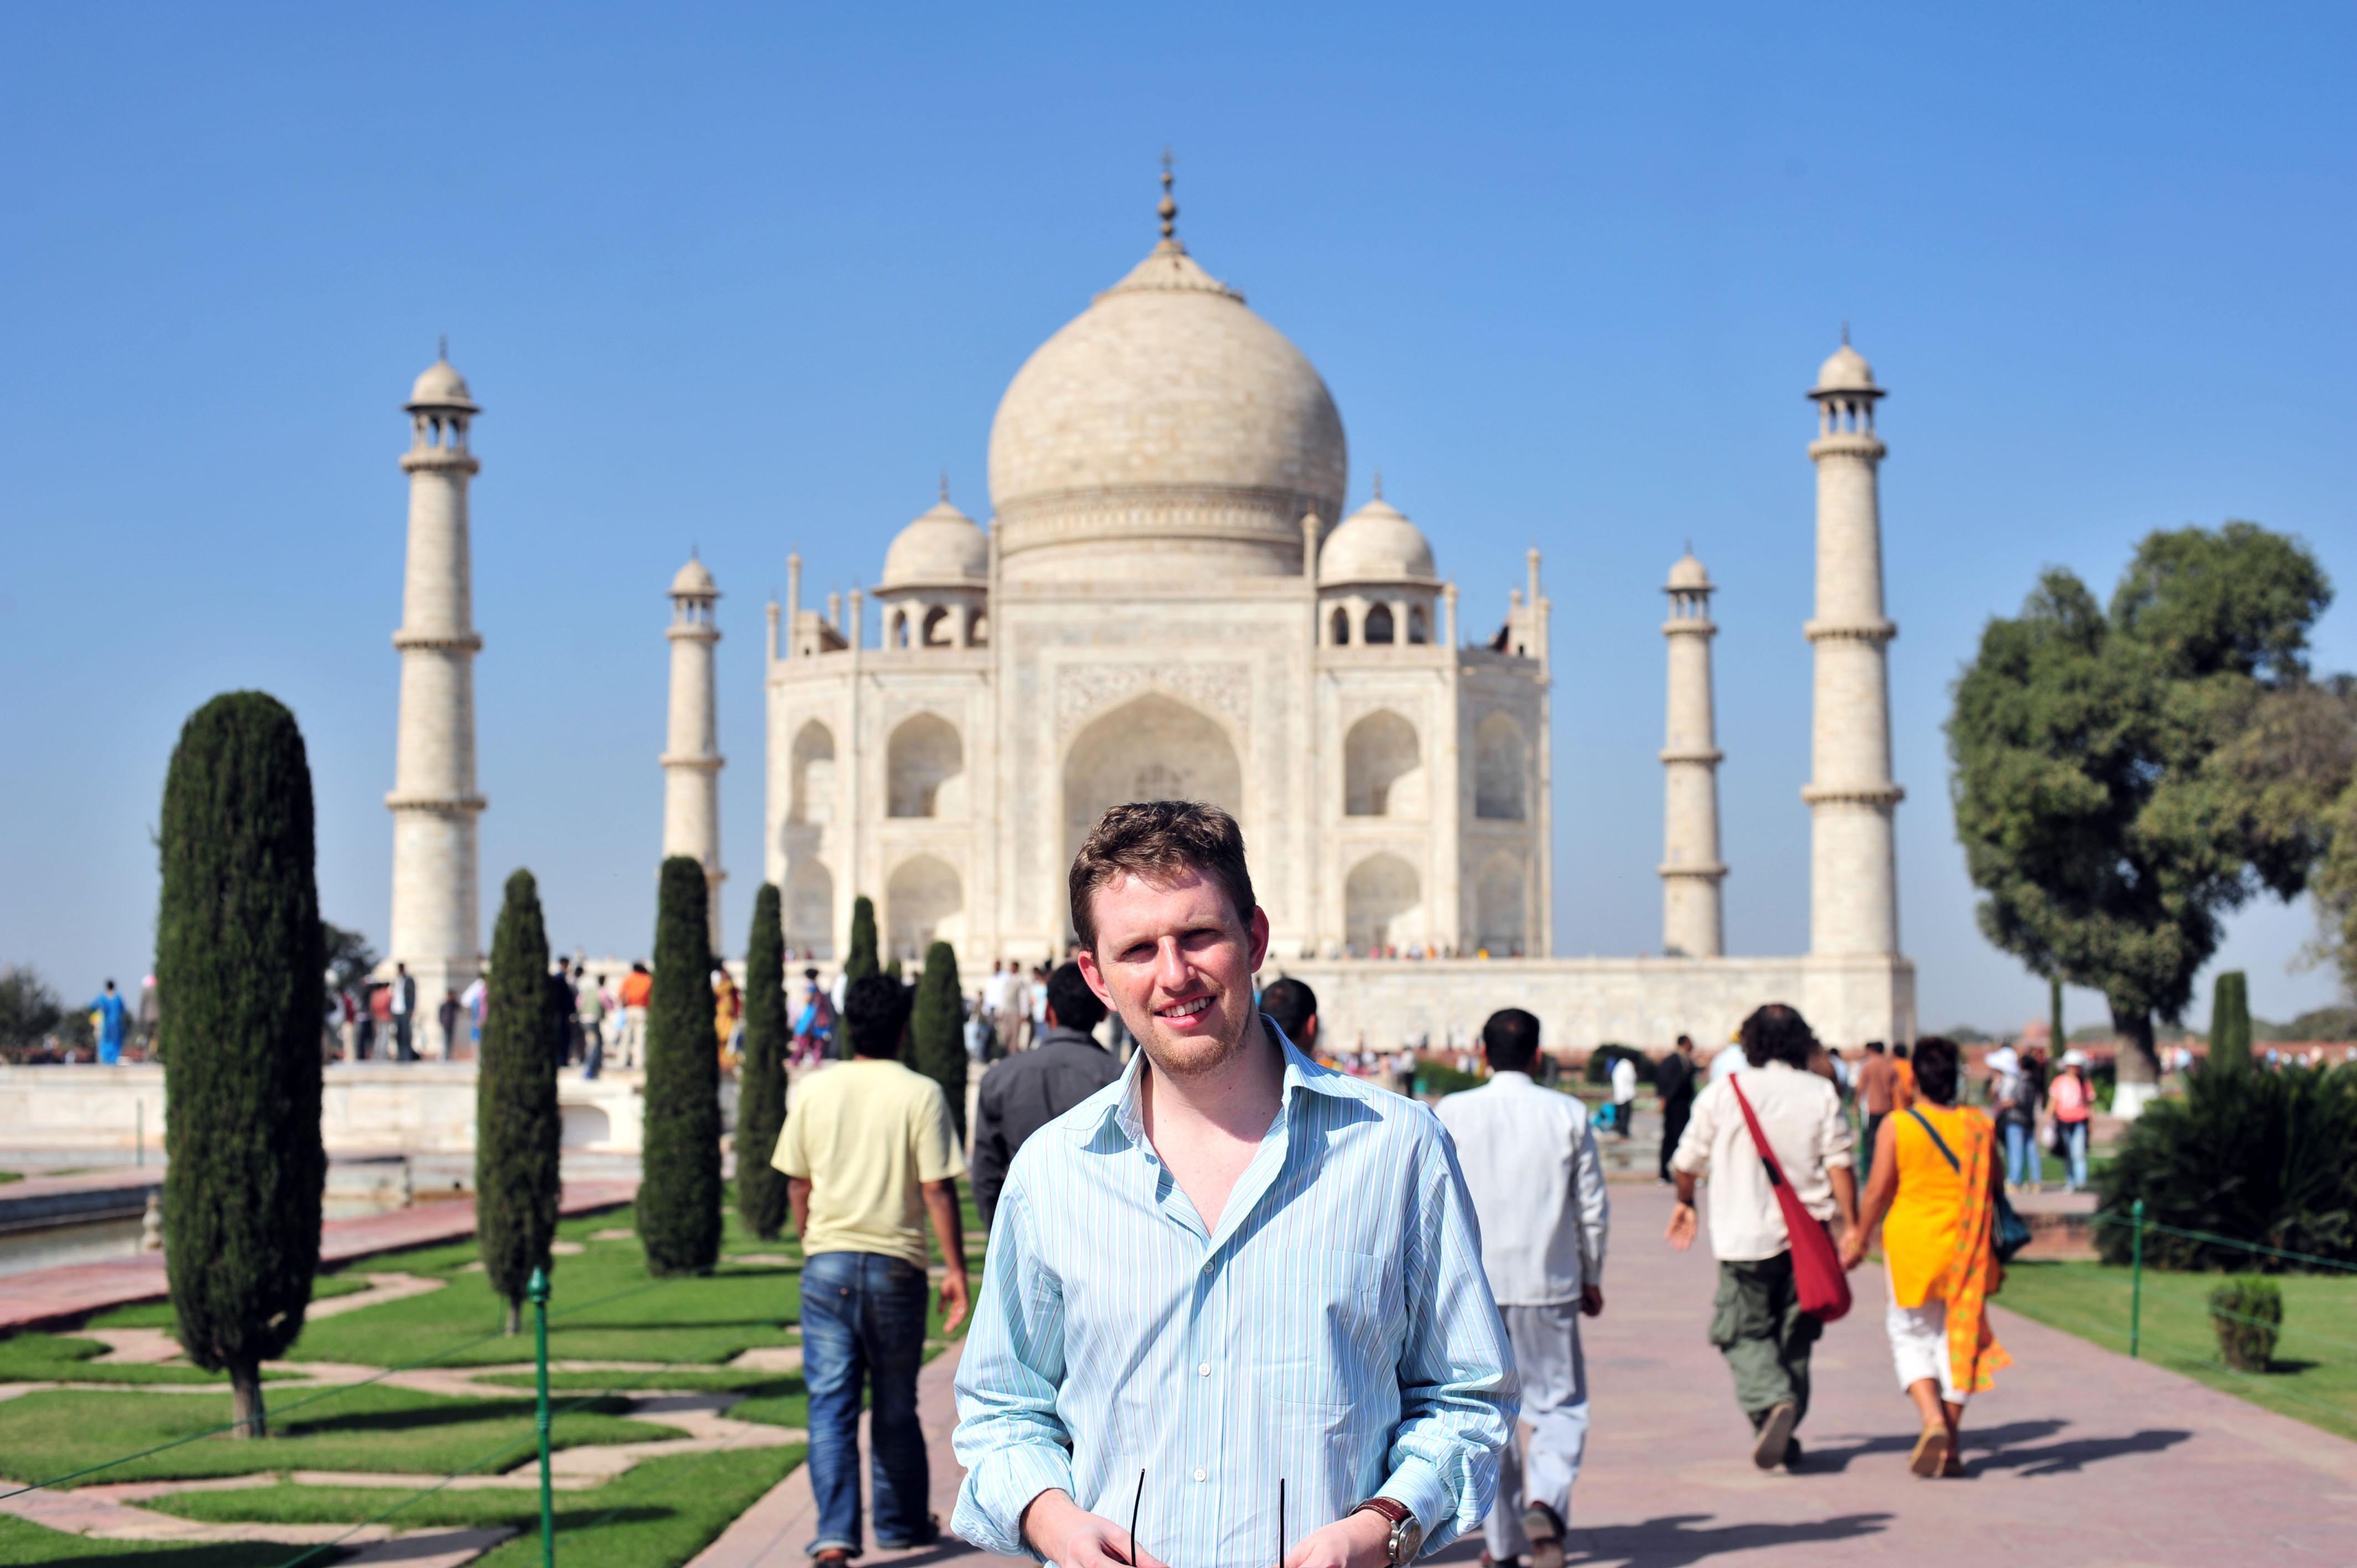 Published on February 19, 2009 in Taj Mahal, Agra Full resolution ...